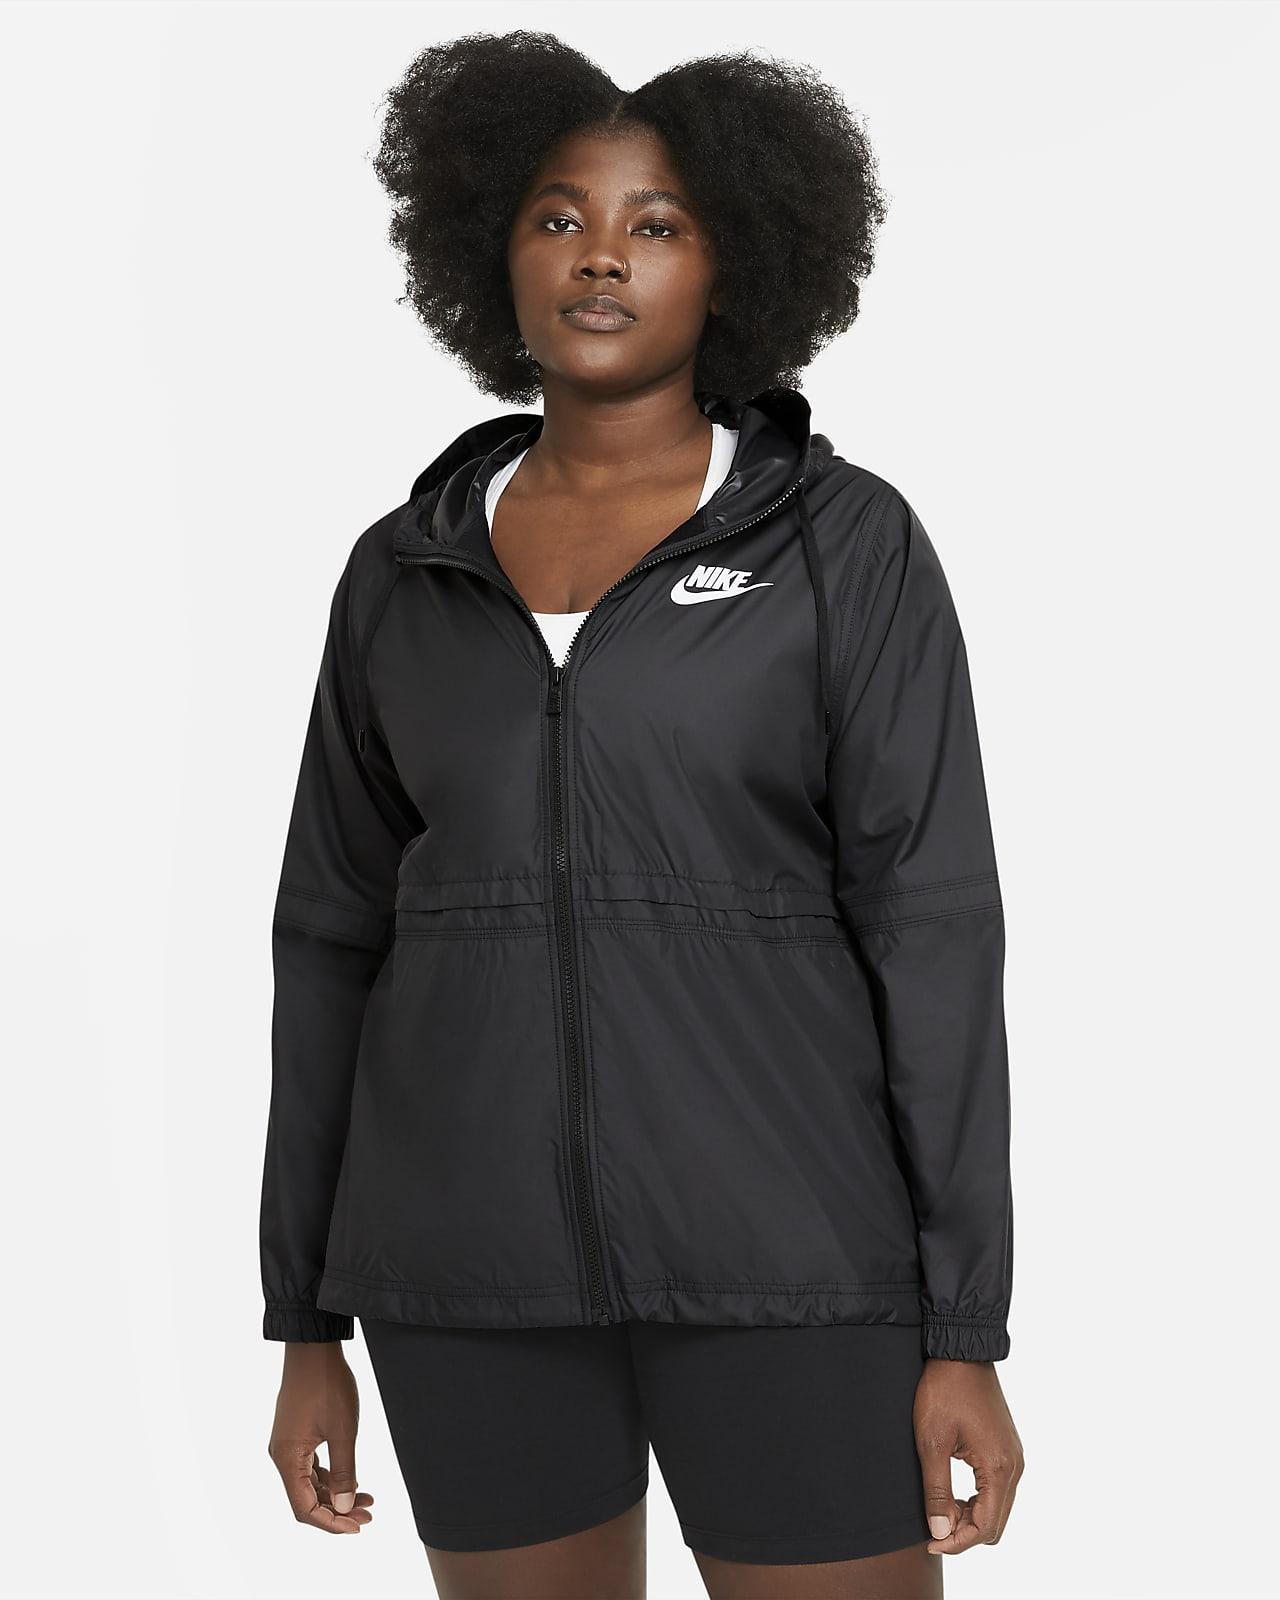 Chamarra de tejido Woven para mujer (talla grande) Nike Sportswear